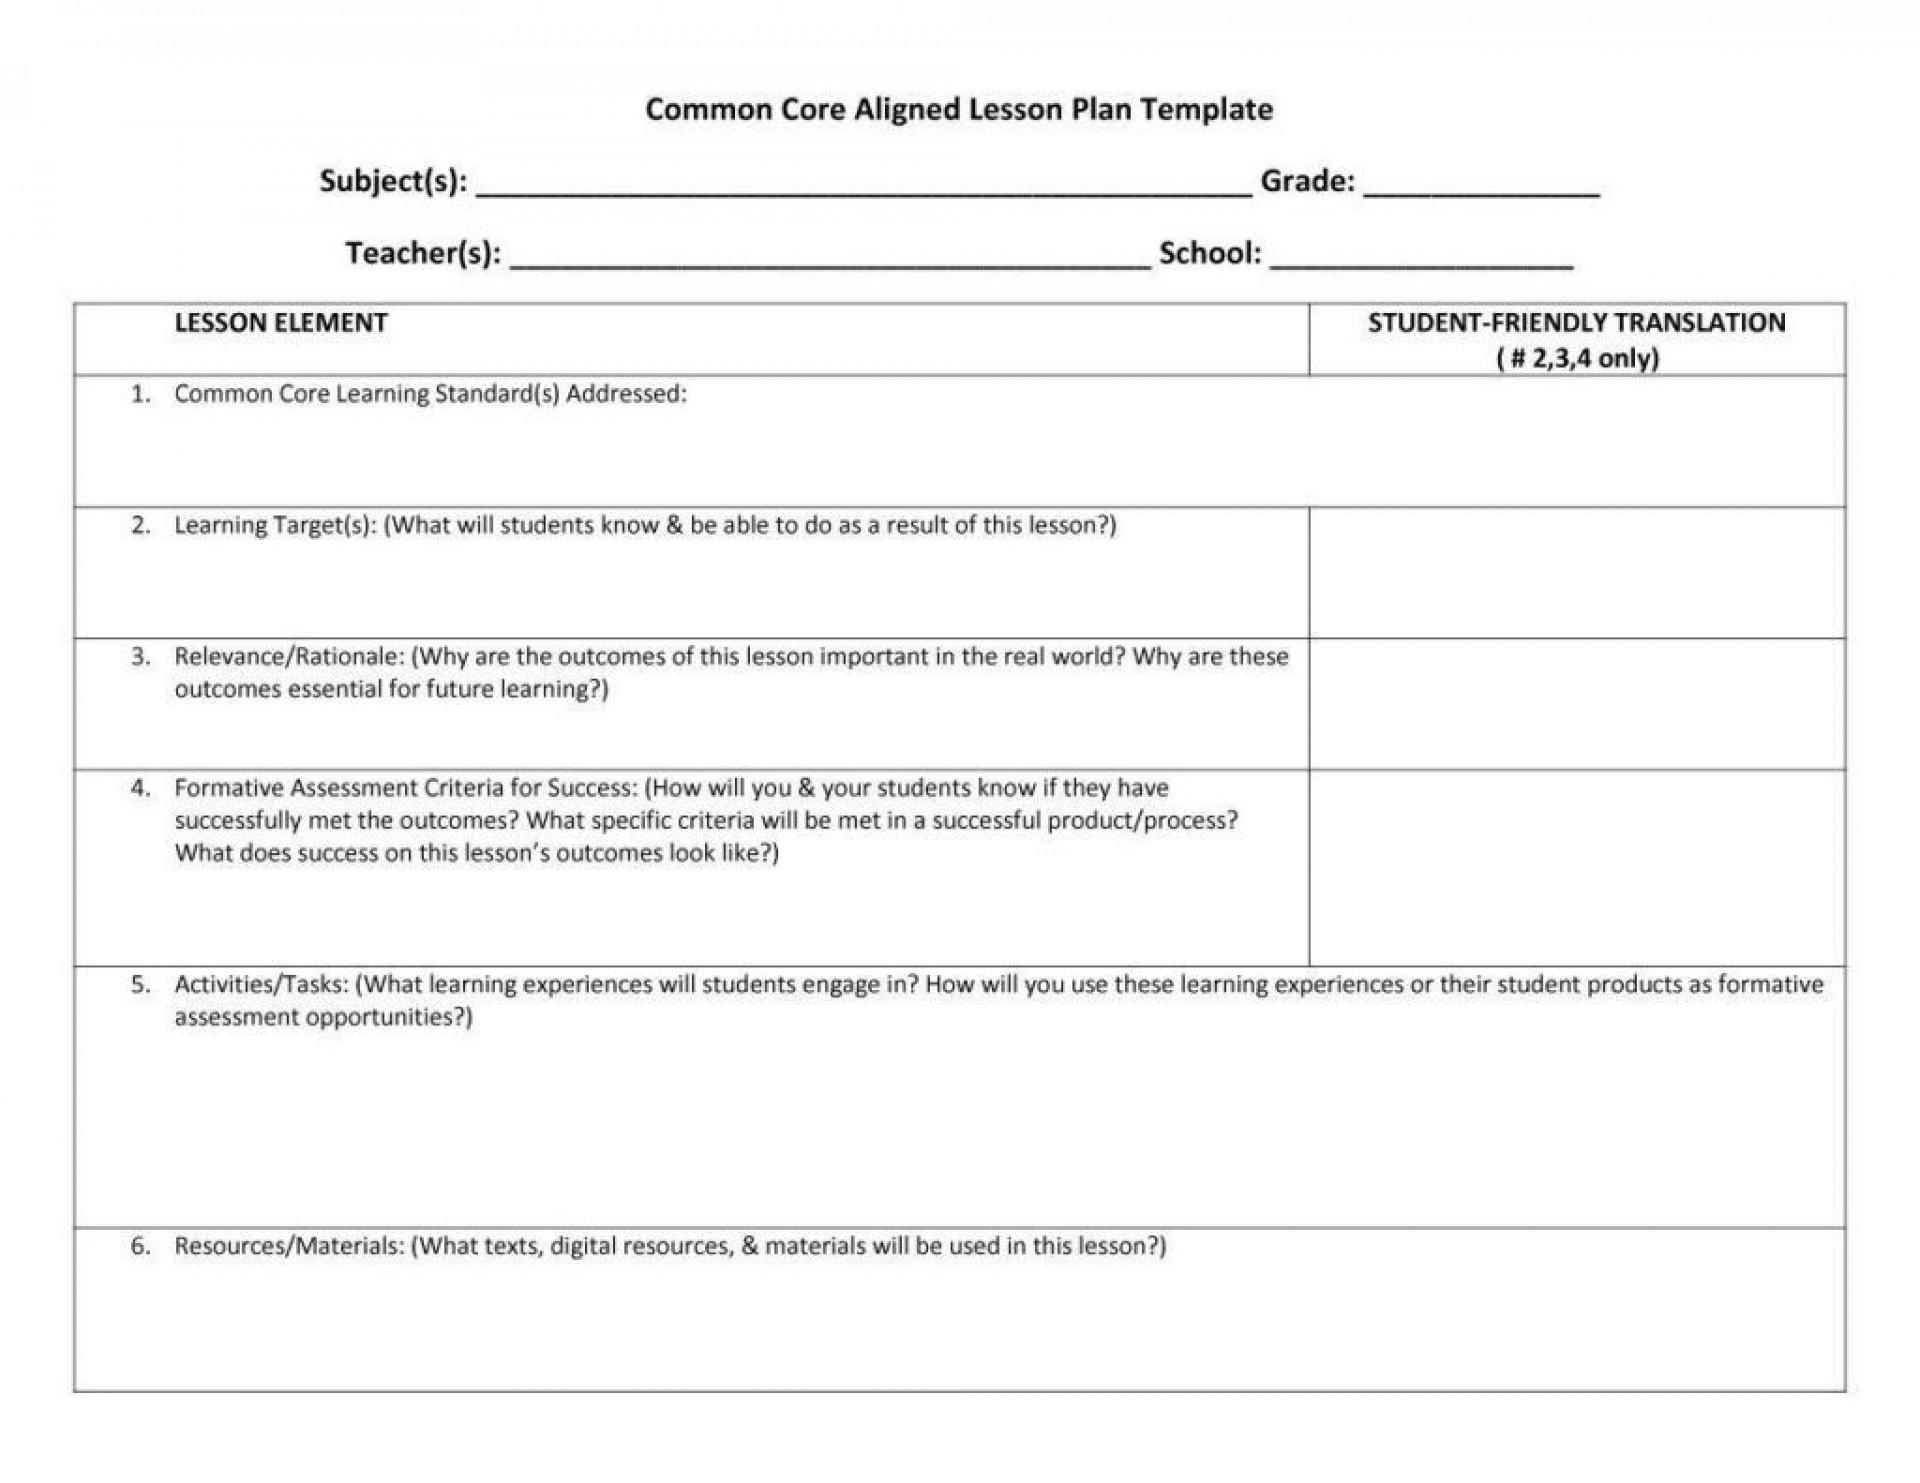 004 Awful Fillable Lesson Plan Template Free Image  Printable Editable1920